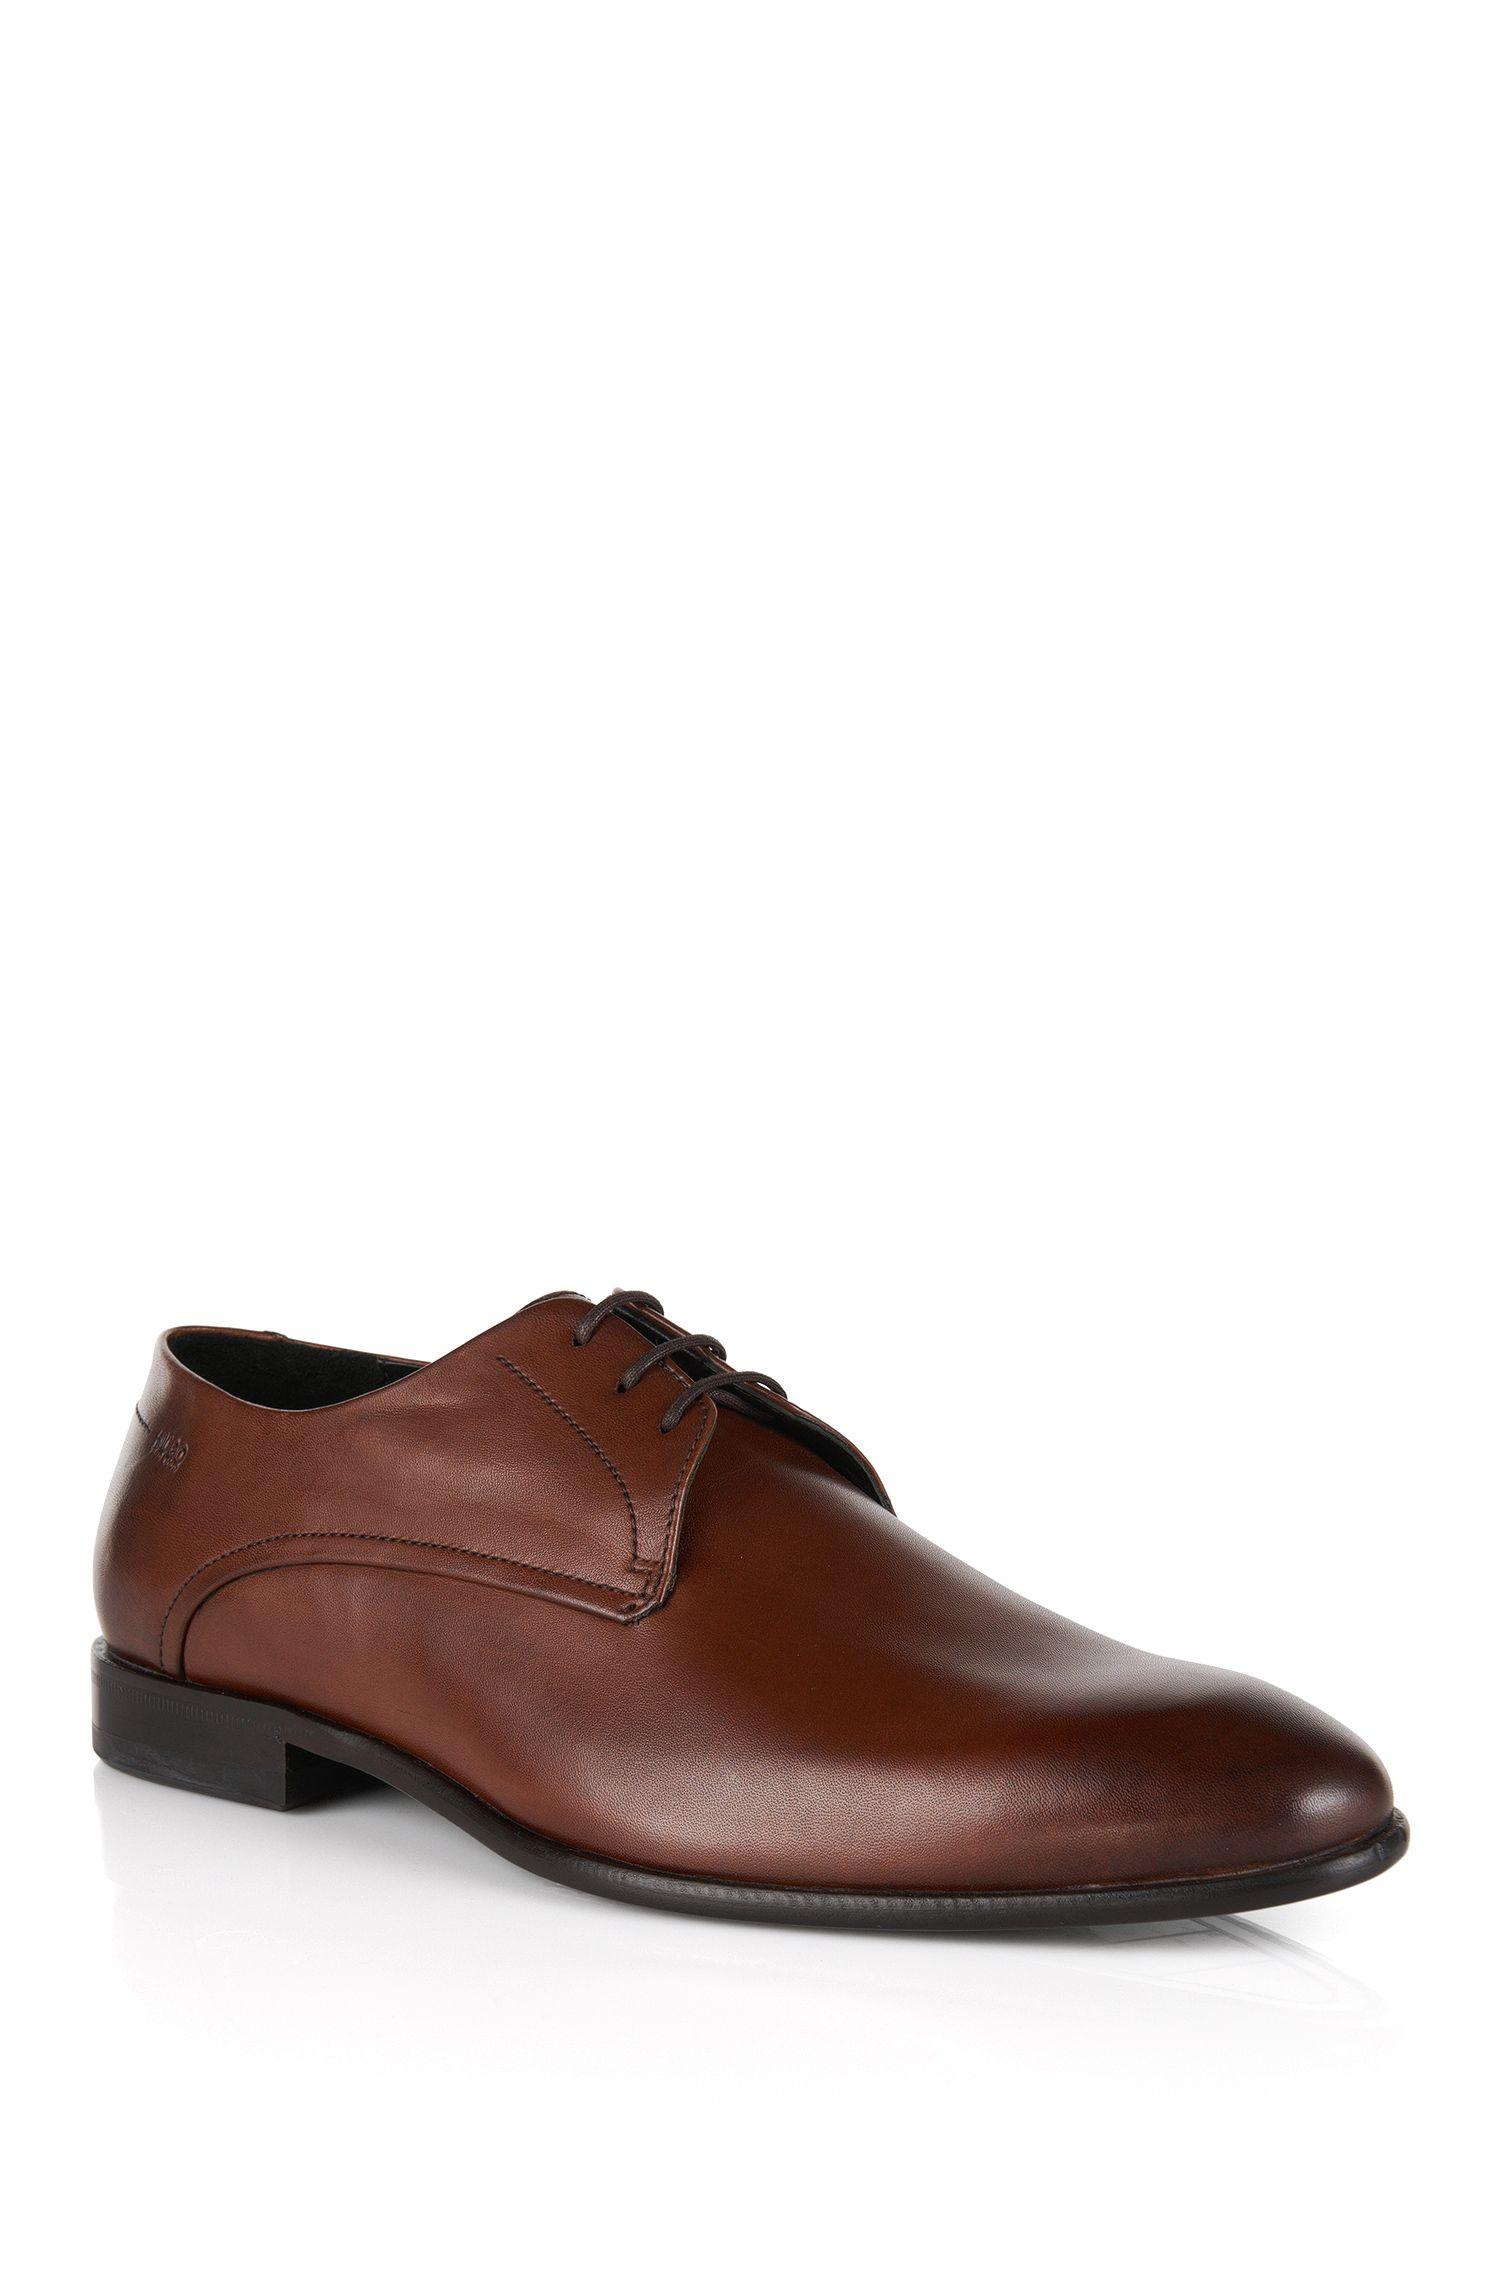 Leather Derby Dress Shoe   C-Dresios